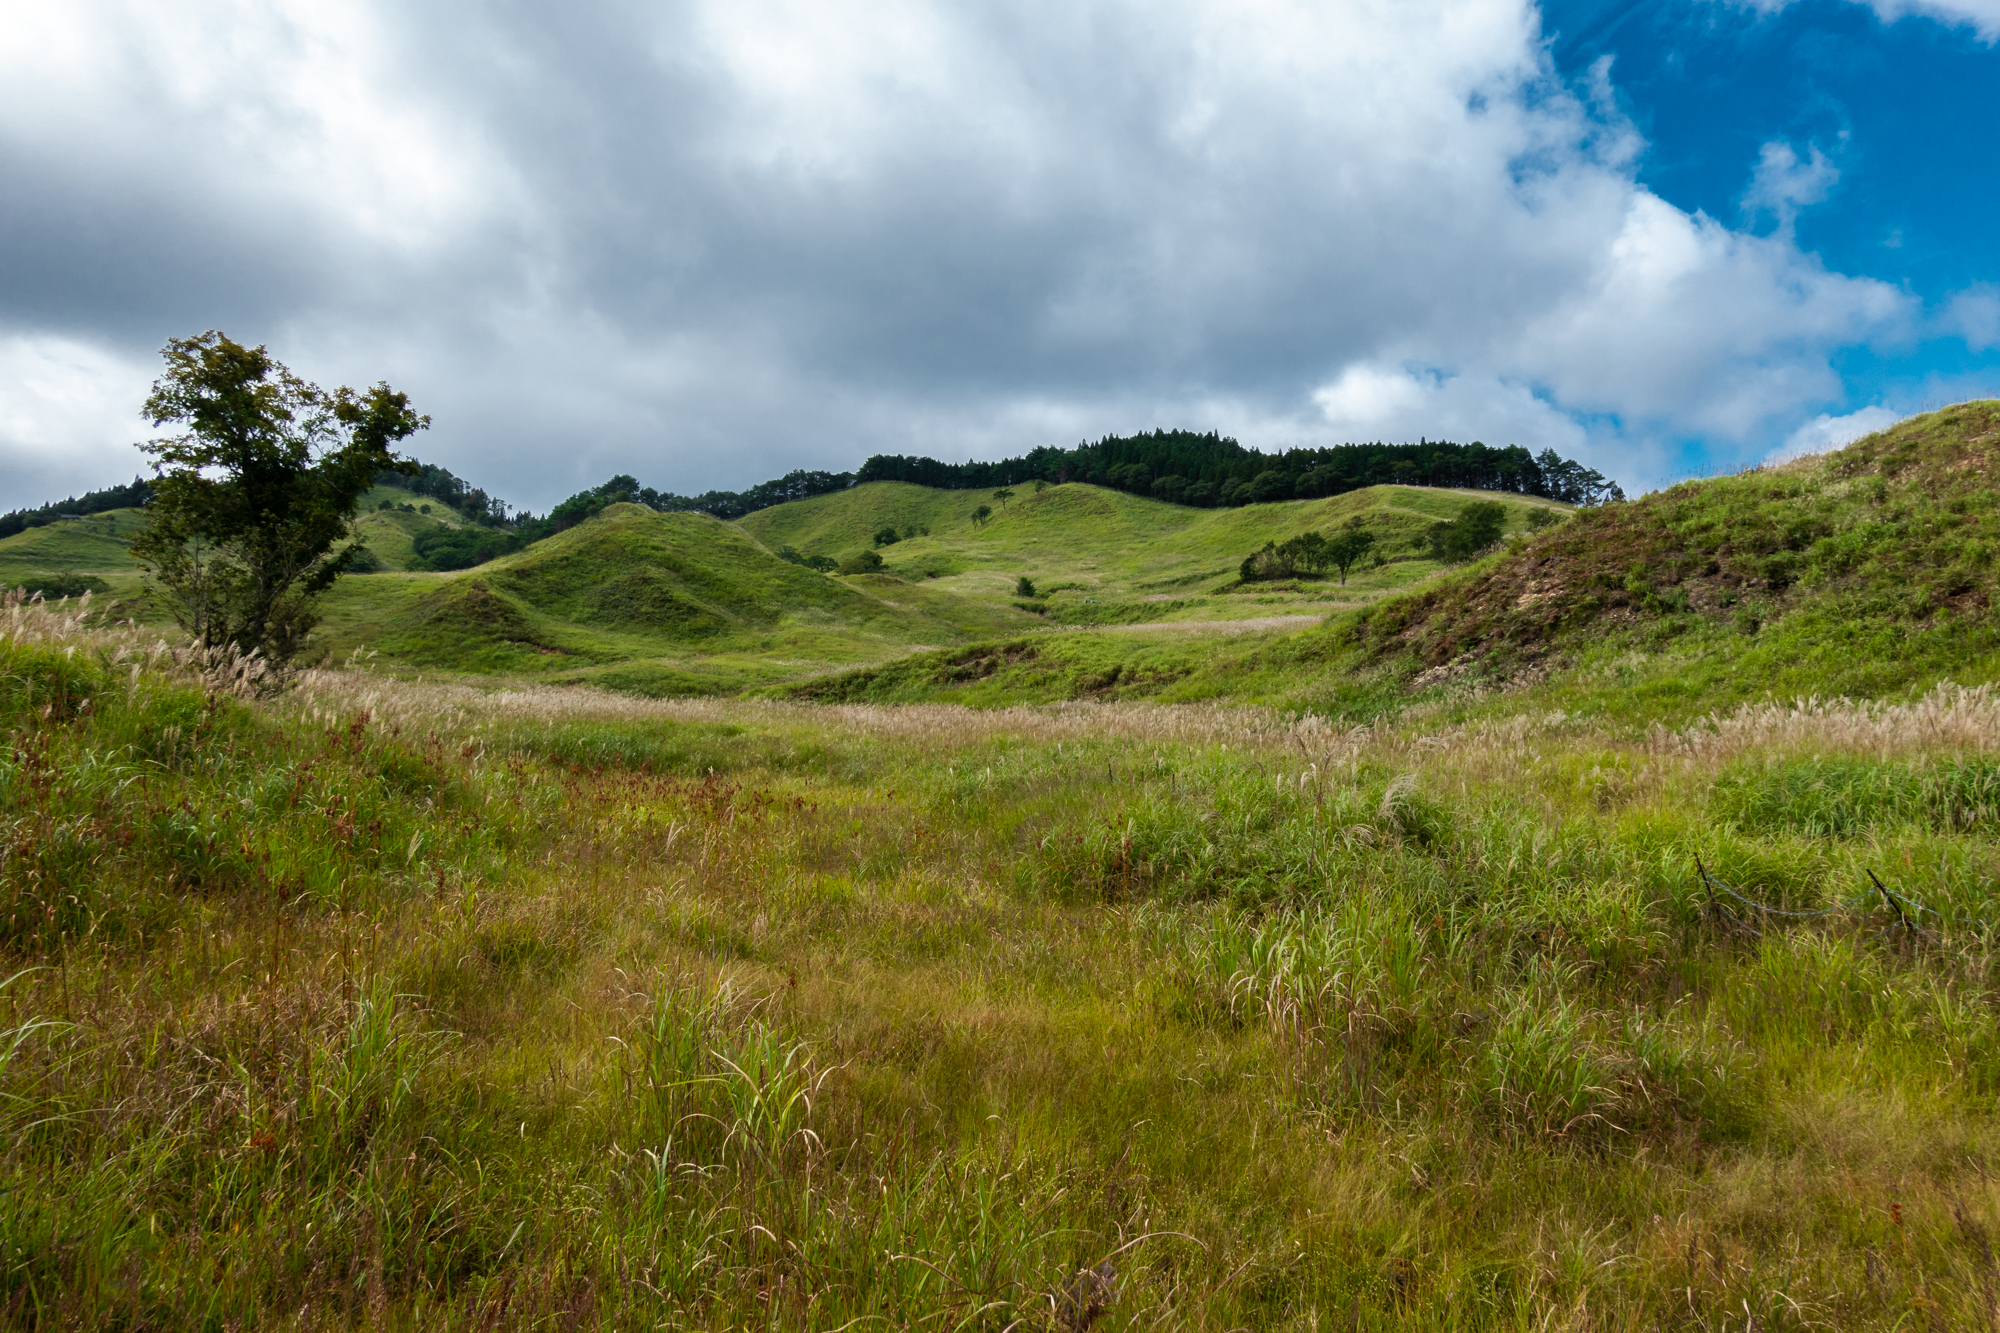 DSC02224 兵庫県 砥峰高原( 一面ススキの草原が広がる絶景の高原写真スポット!撮影した写真の紹介、 アクセス情報や撮影ポイントなど!)